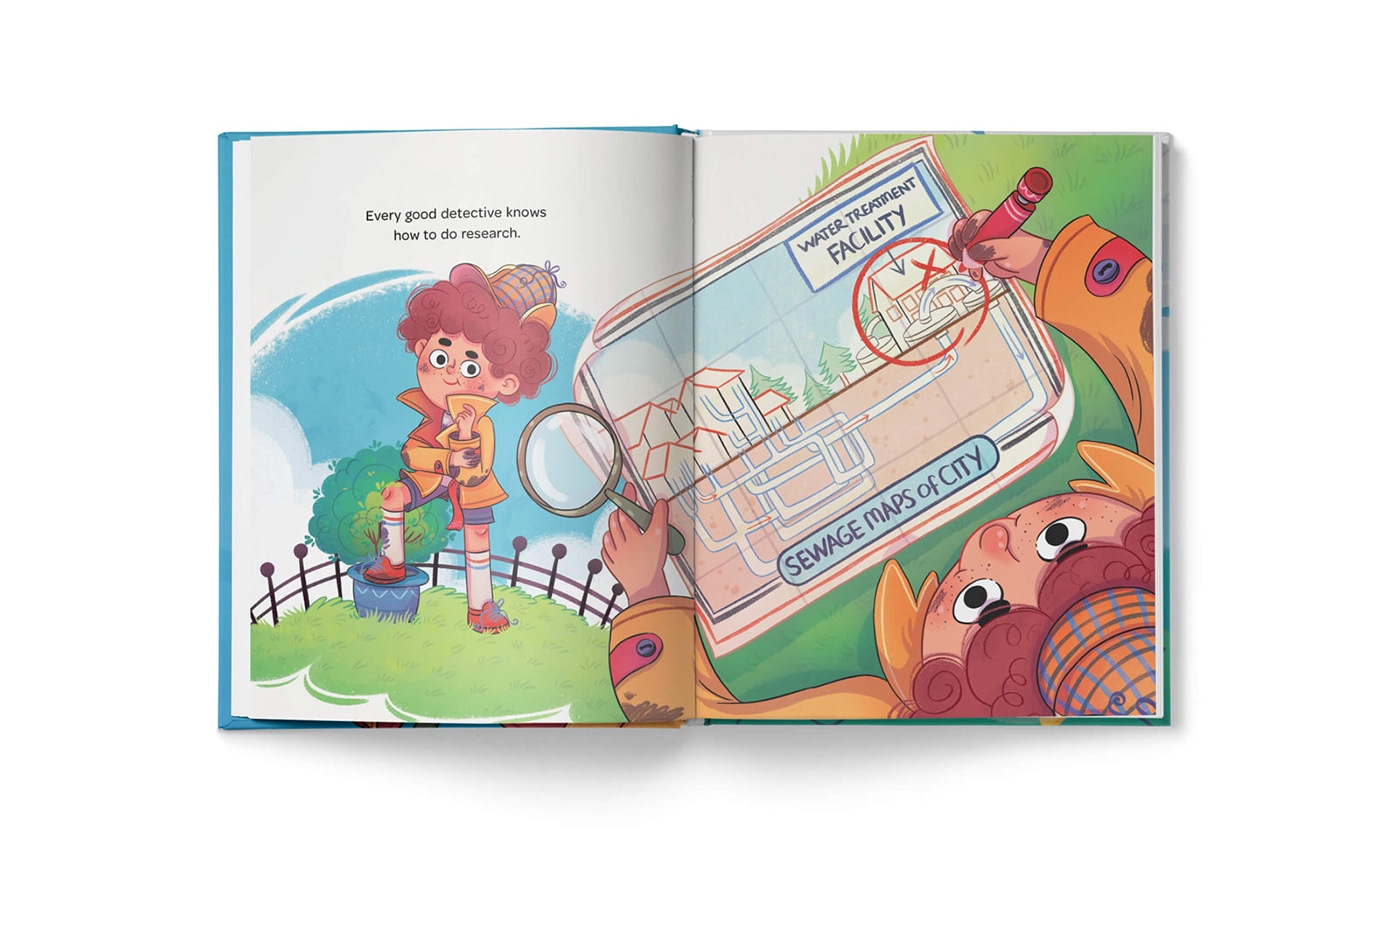 Picture book childrens book kidlit kidlitart fish storybook storyboard